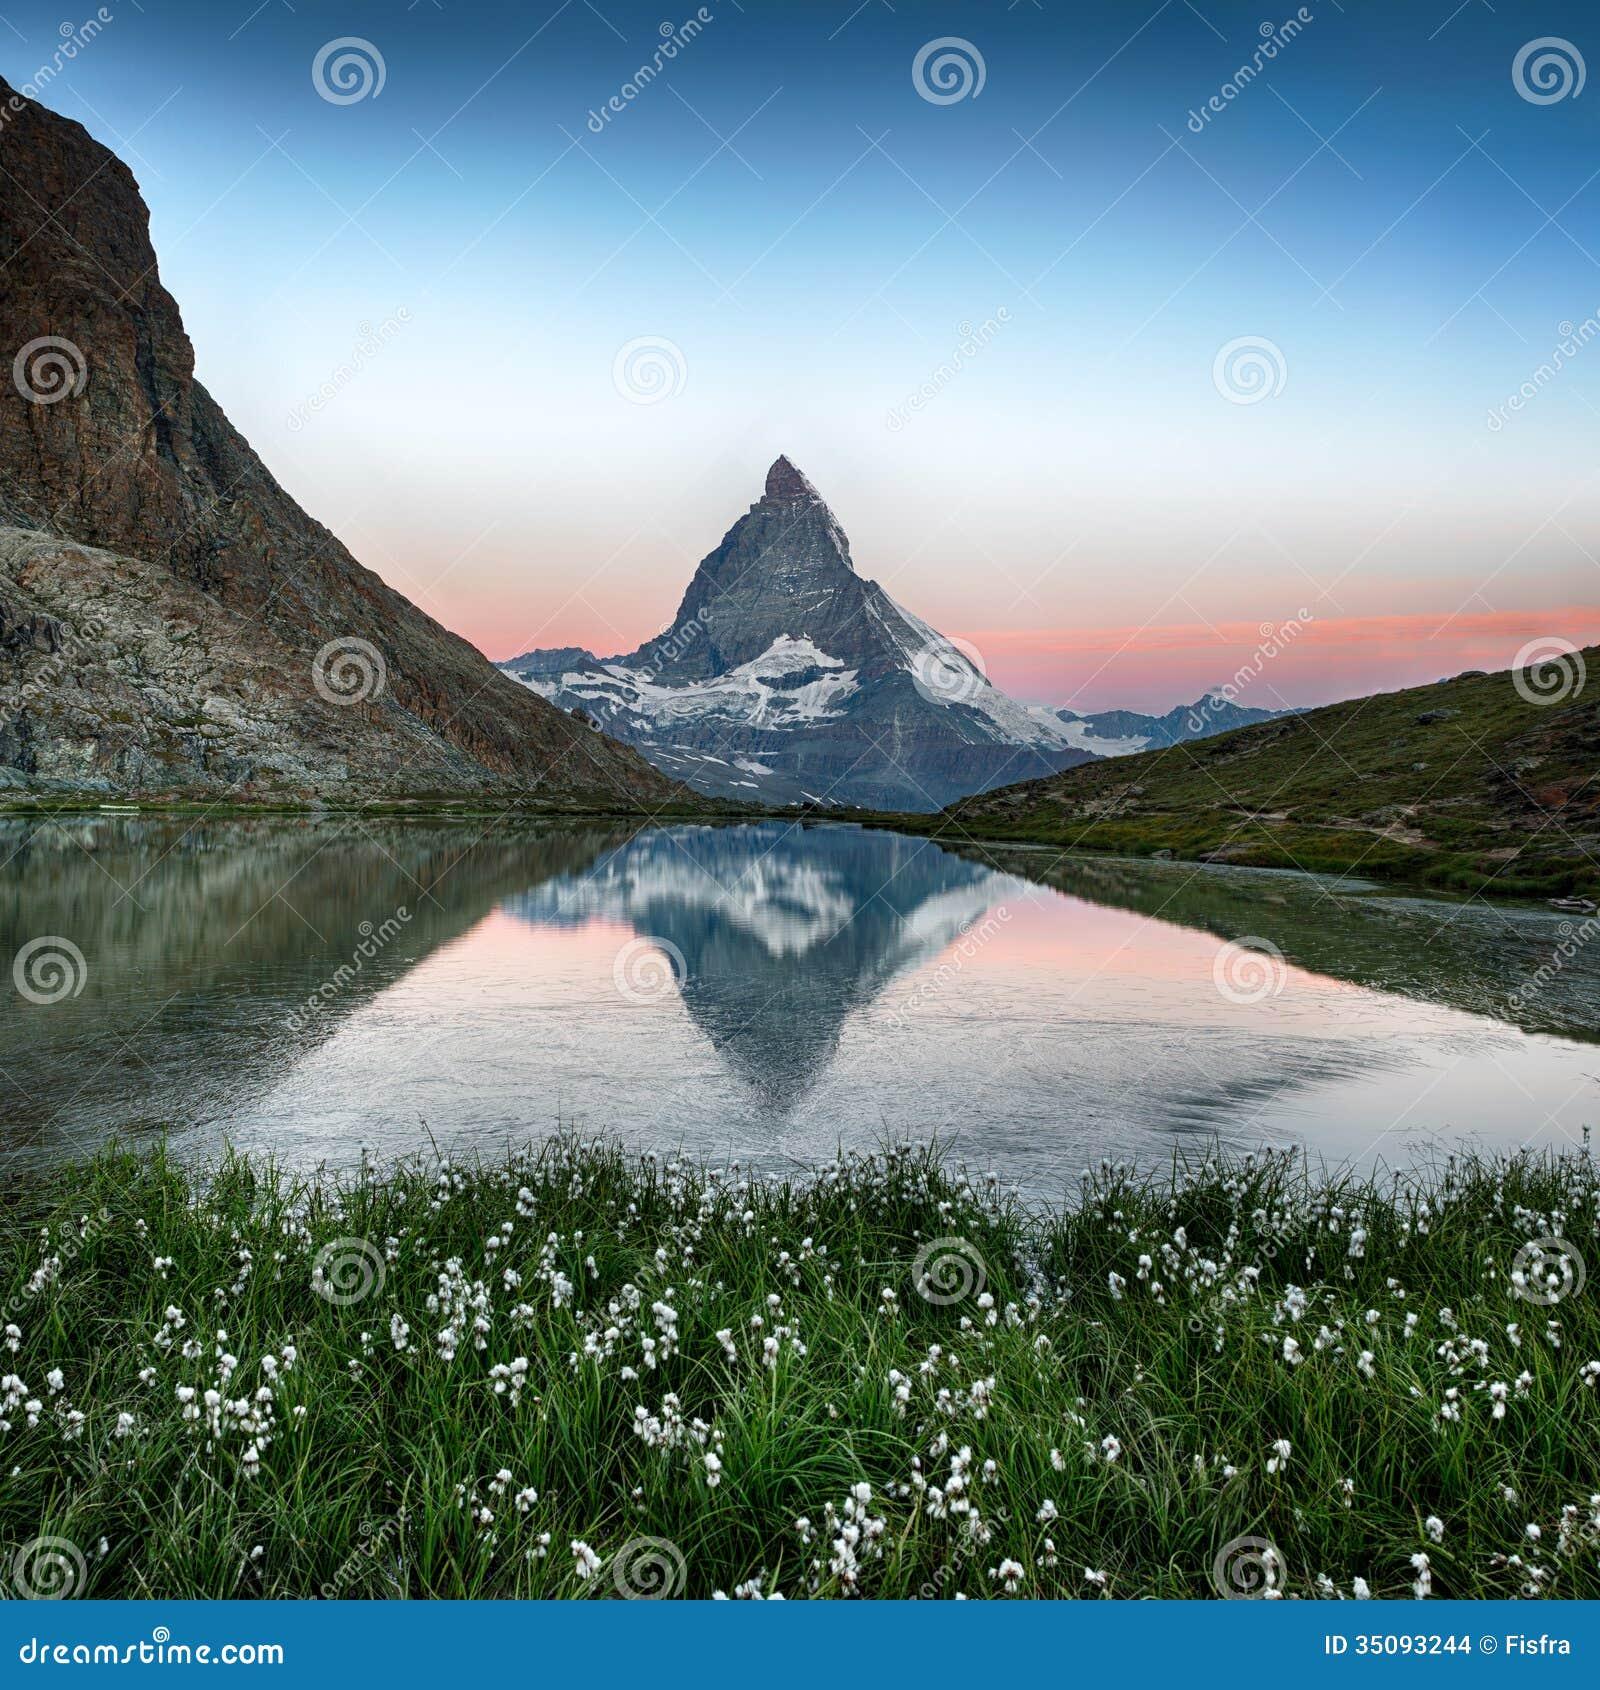 Matterhorn reflection in Riffelsee with flowers, Zermatt, Alps,